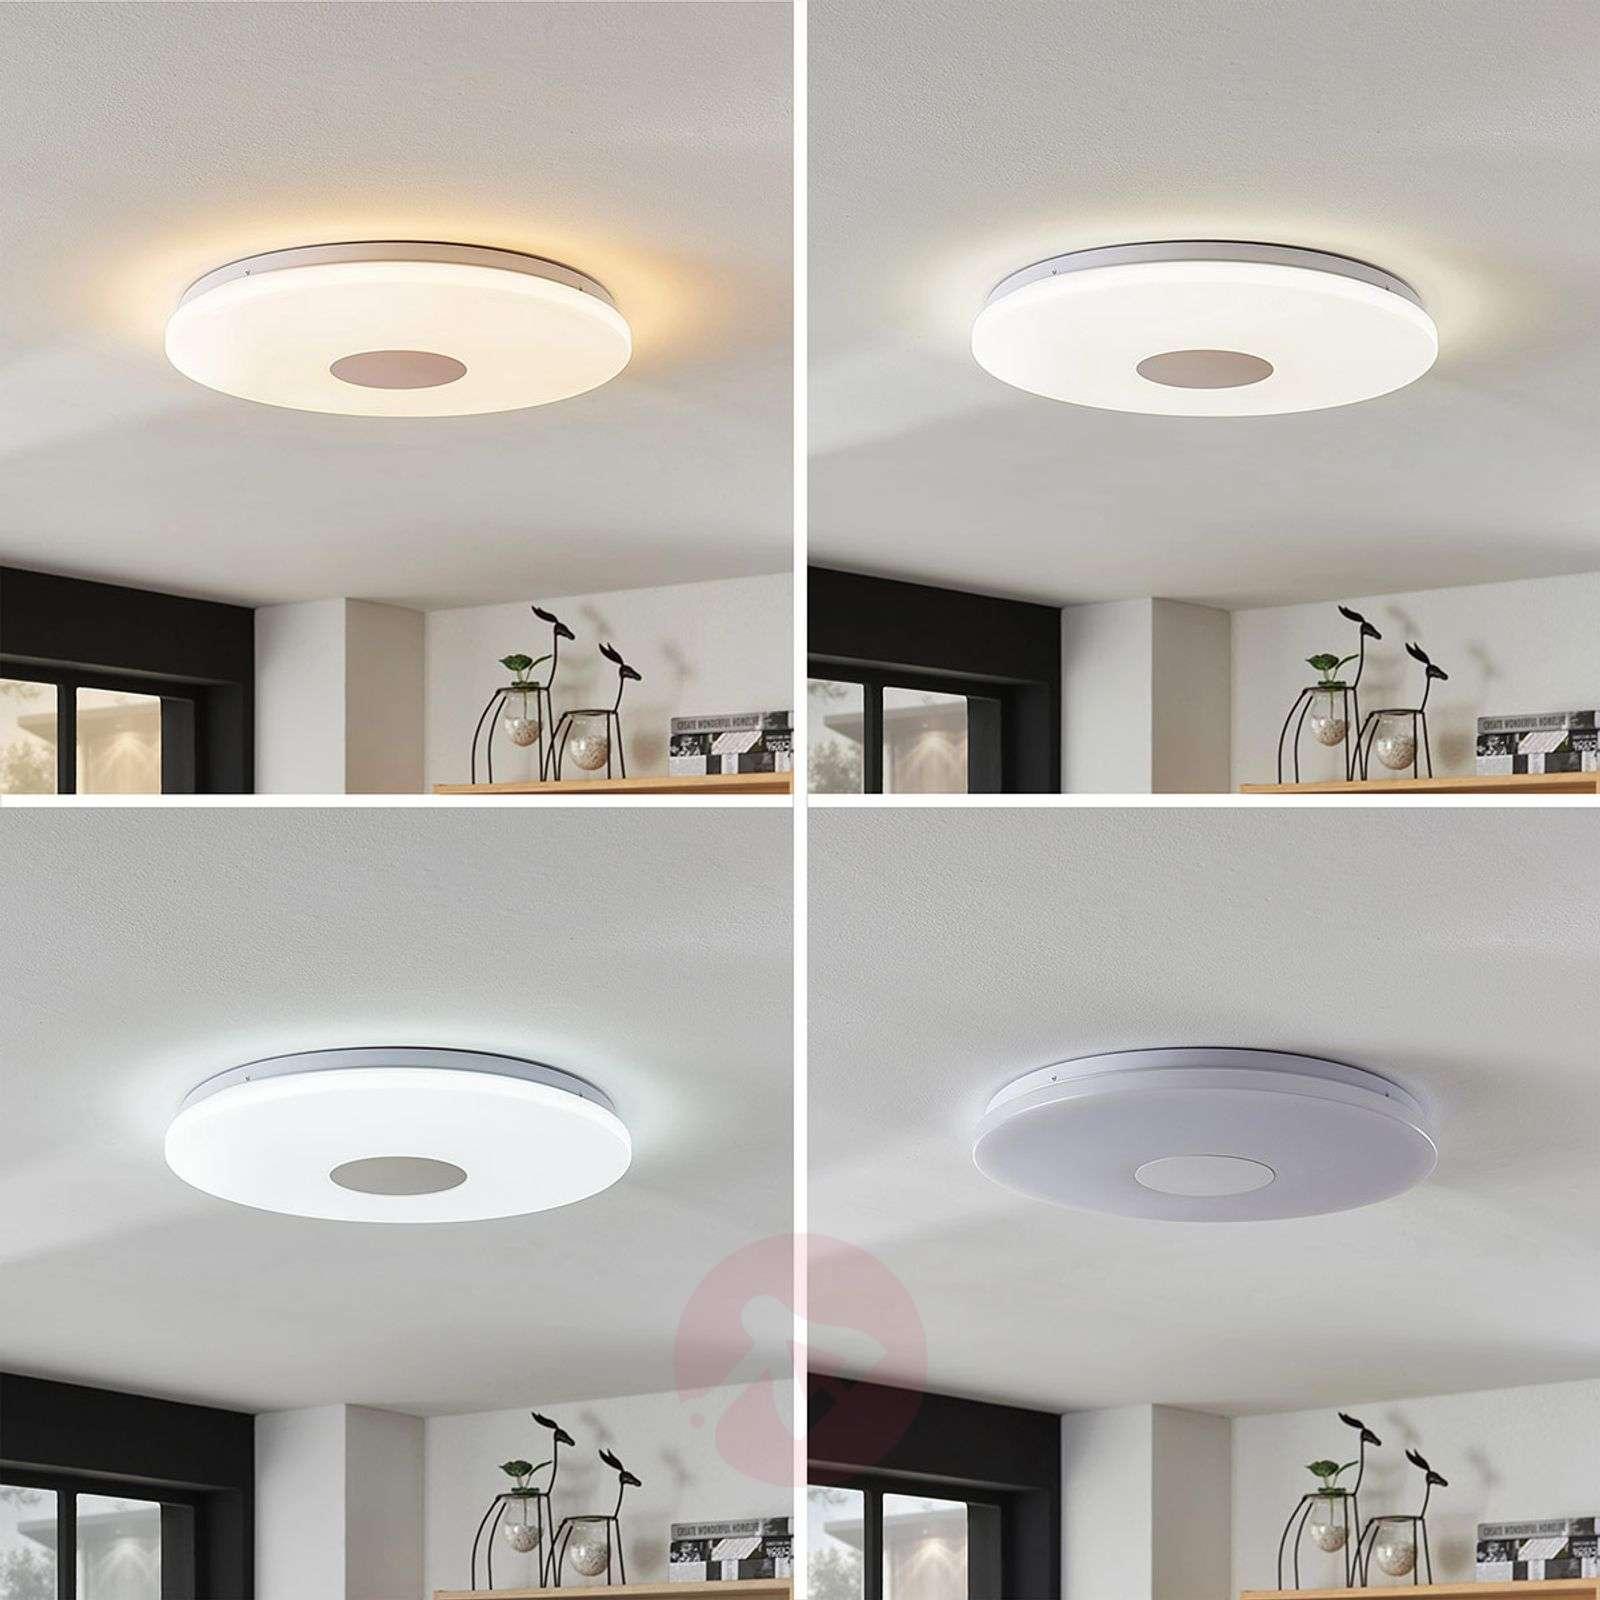 Functional LED ceiling light Renee, 25 W-9634002-014